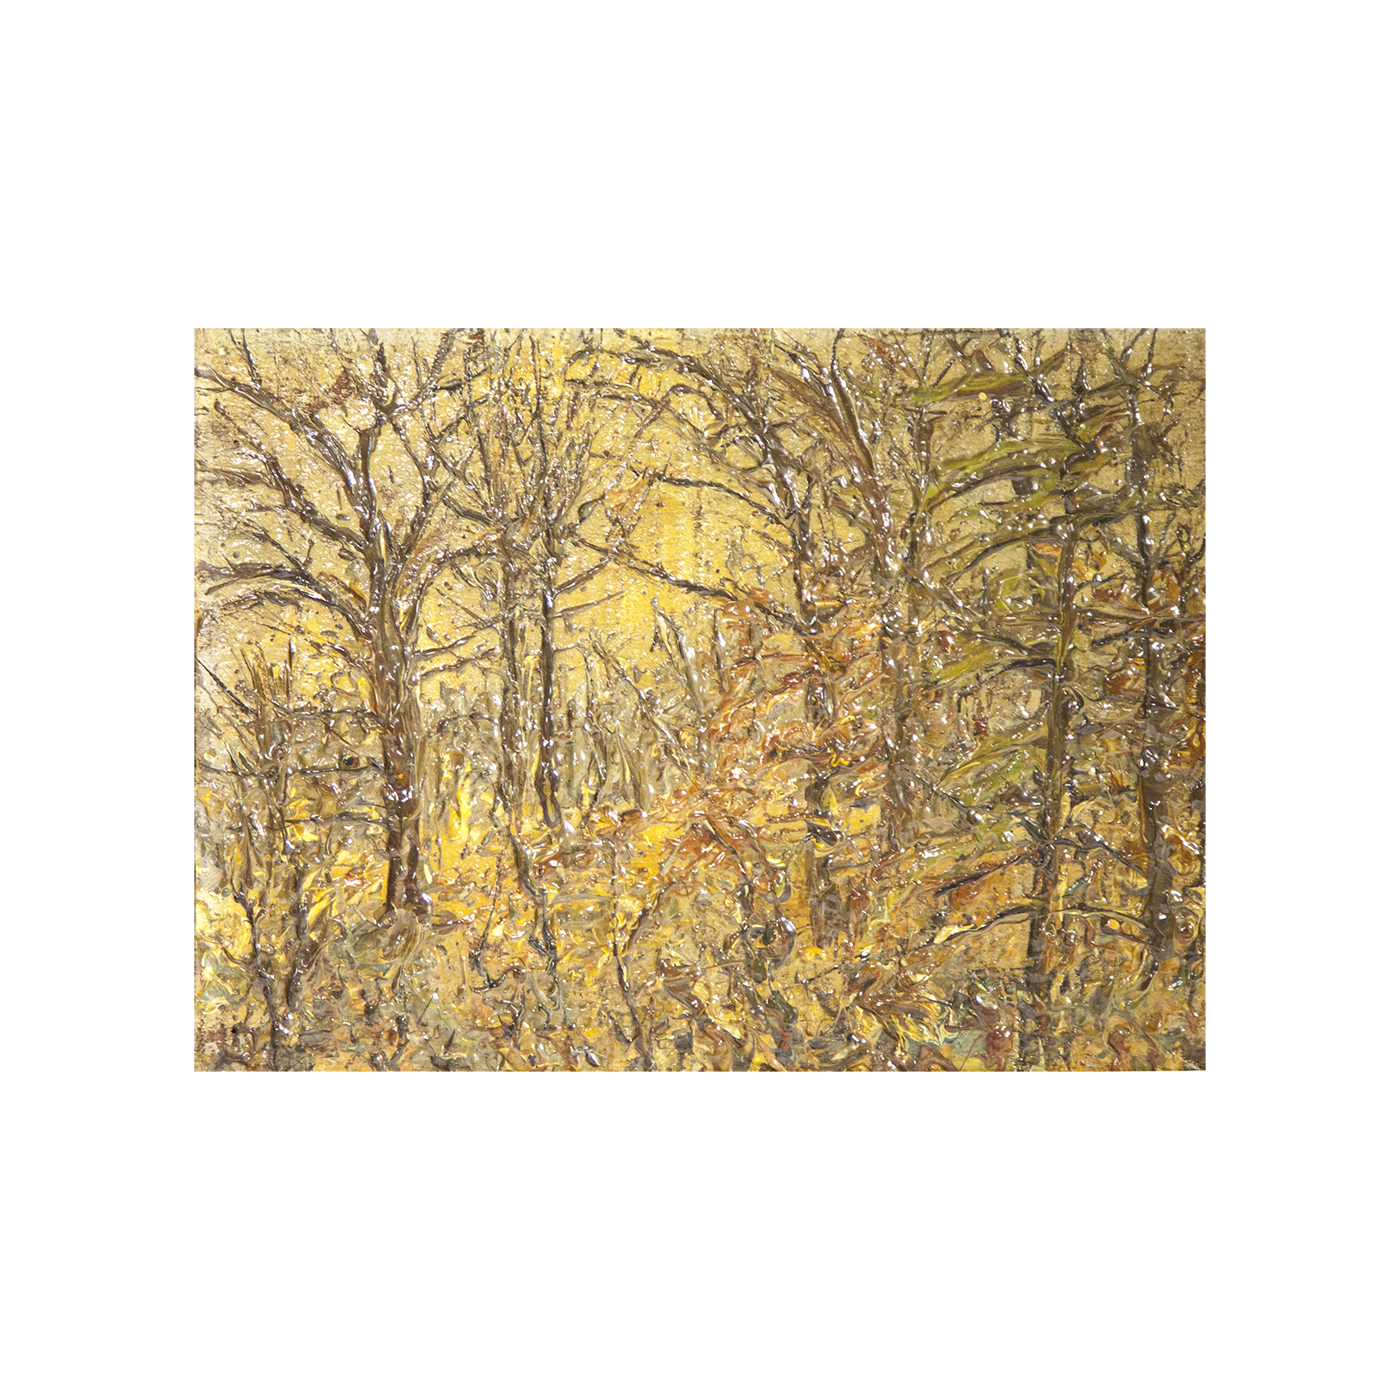 William Bils [18721944] New York impressionist Landscape